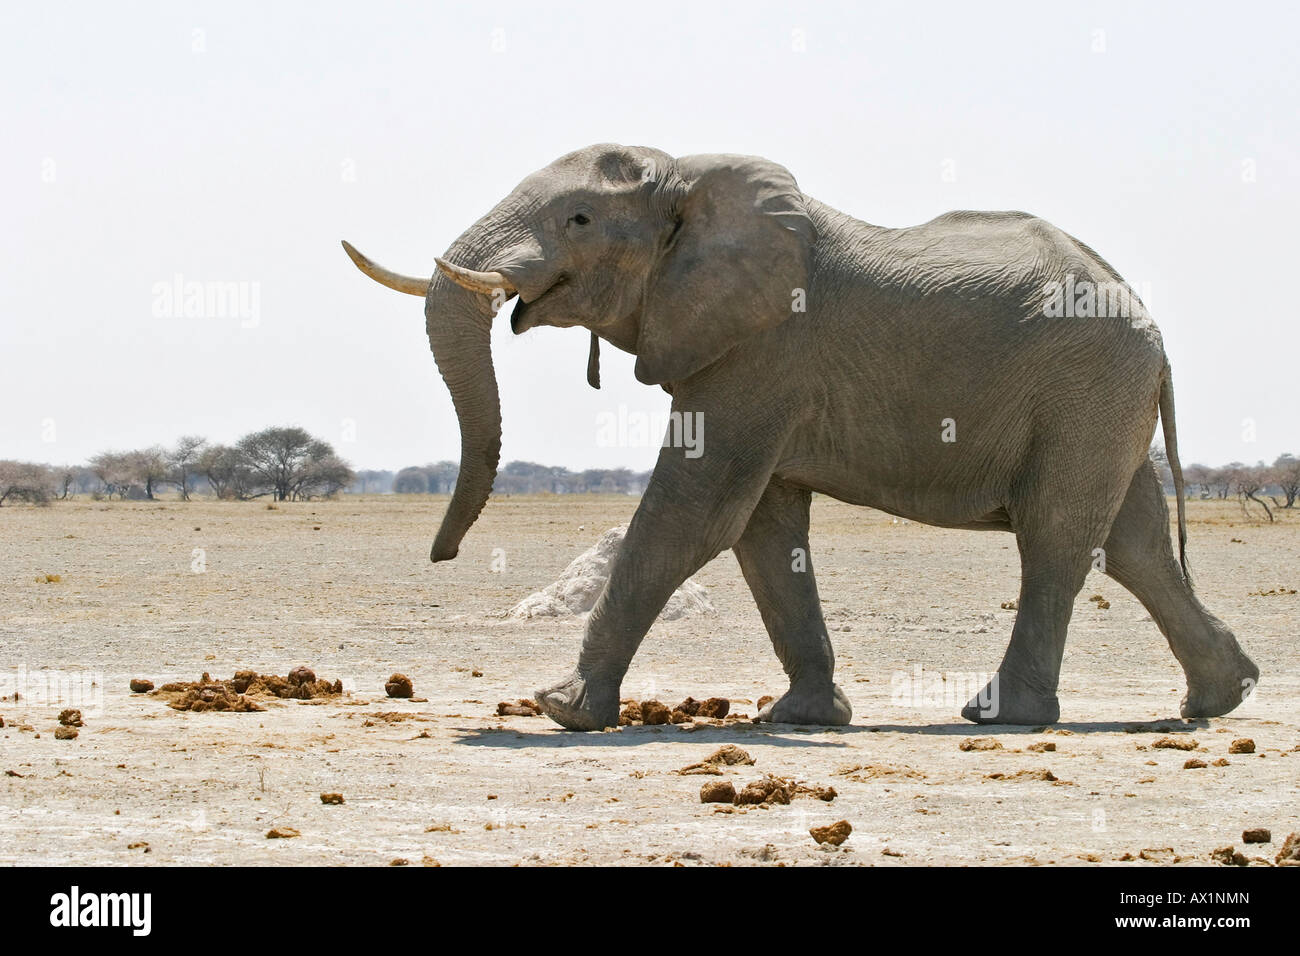 African Elephant (Loxodonta africana) Nxai Pan, Makgadikgadi Pans National Park, Botswana, Africa Stock Photo